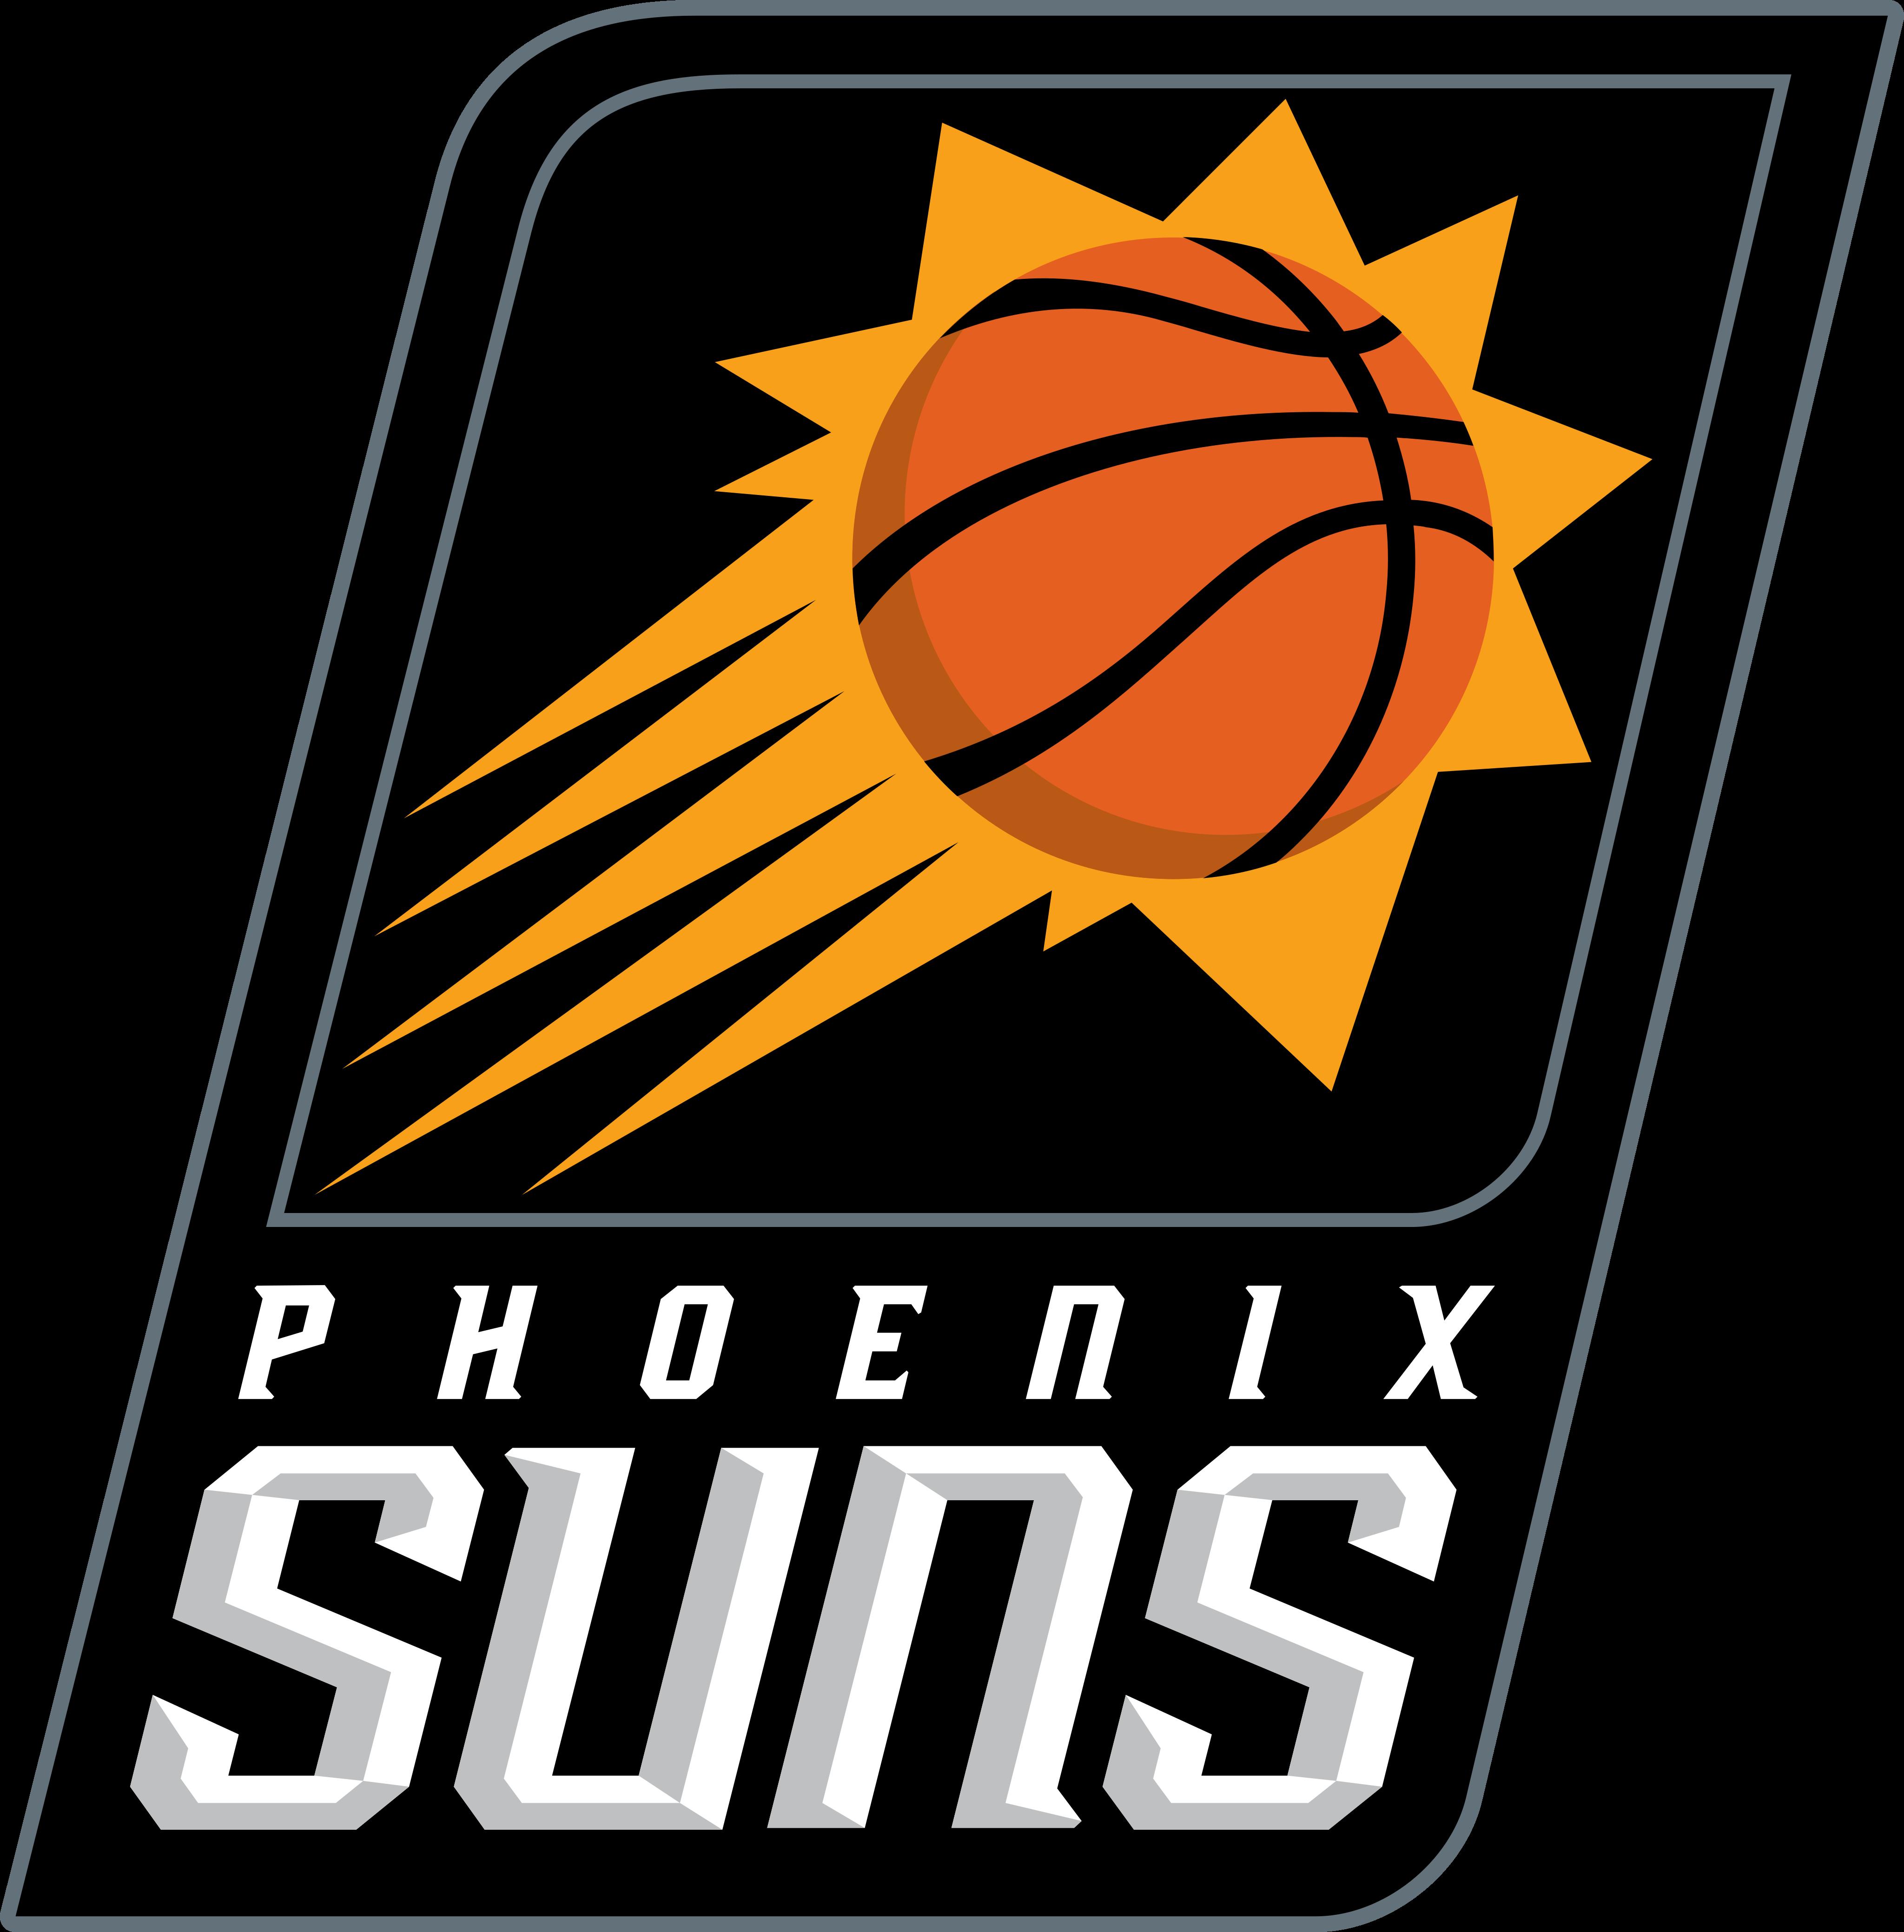 phoenix suns logo - Phoenix Suns Logo